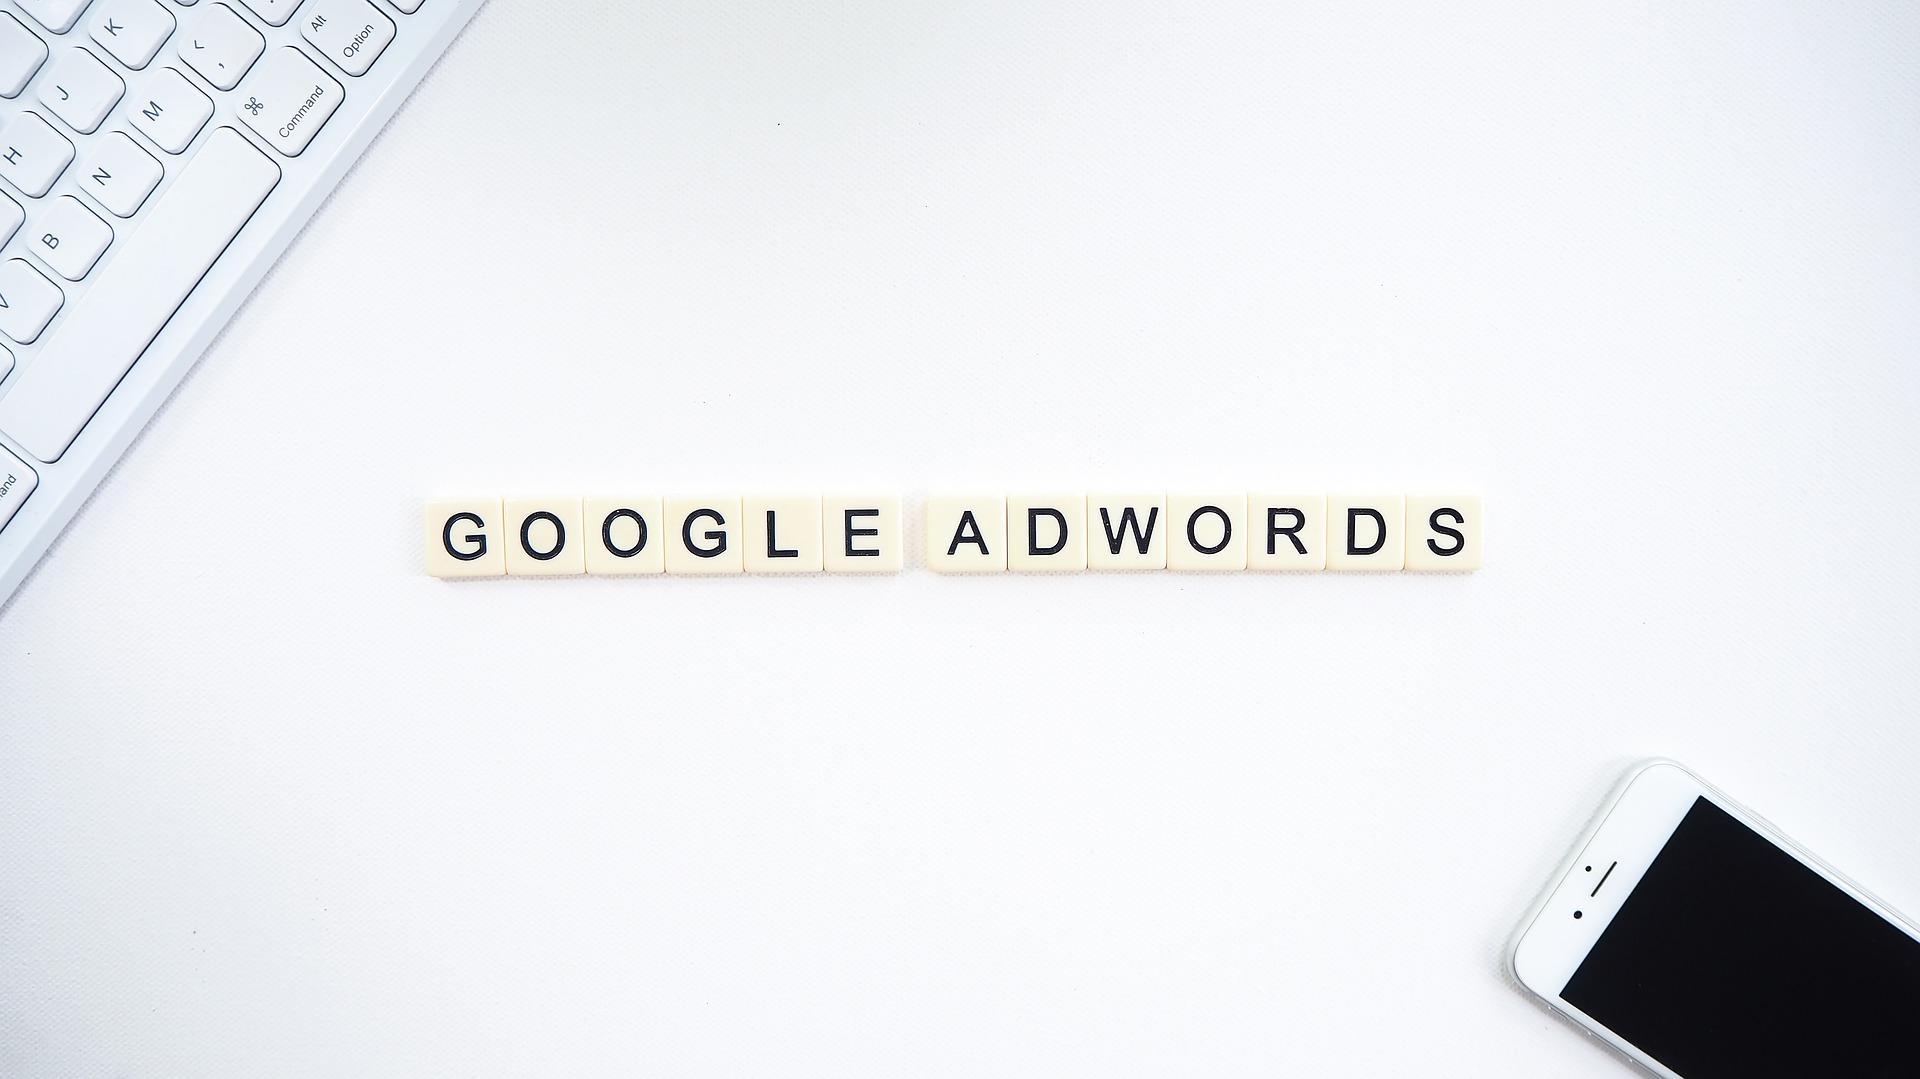 GoogleAds Essentials for success